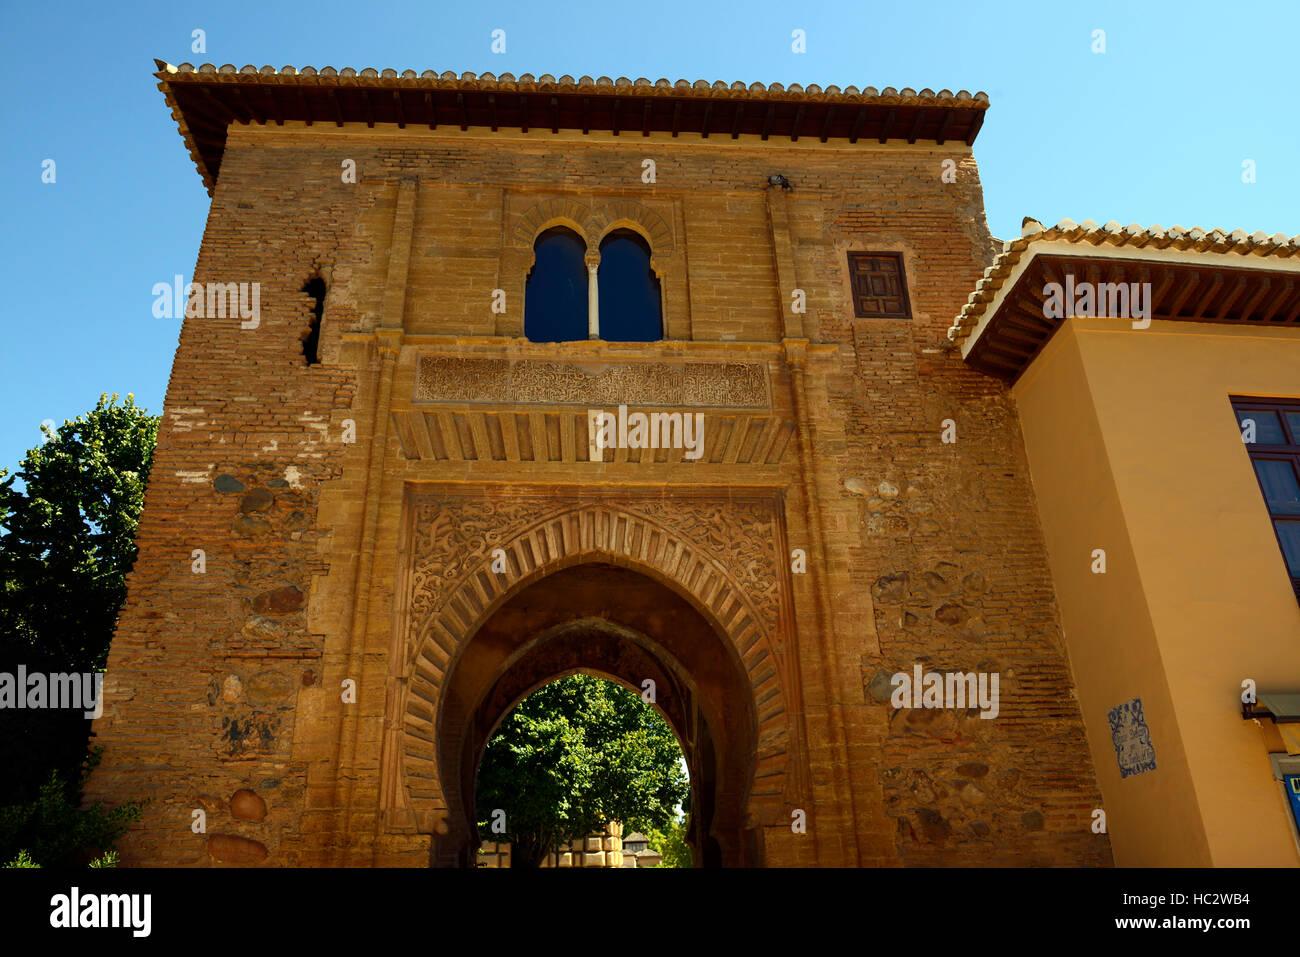 Porta vino Puerta del Vino Carlos V Palazzo Alhambra Palace Gardens alcazaba arch gateway arcuata Granada Andalusia Foto Stock